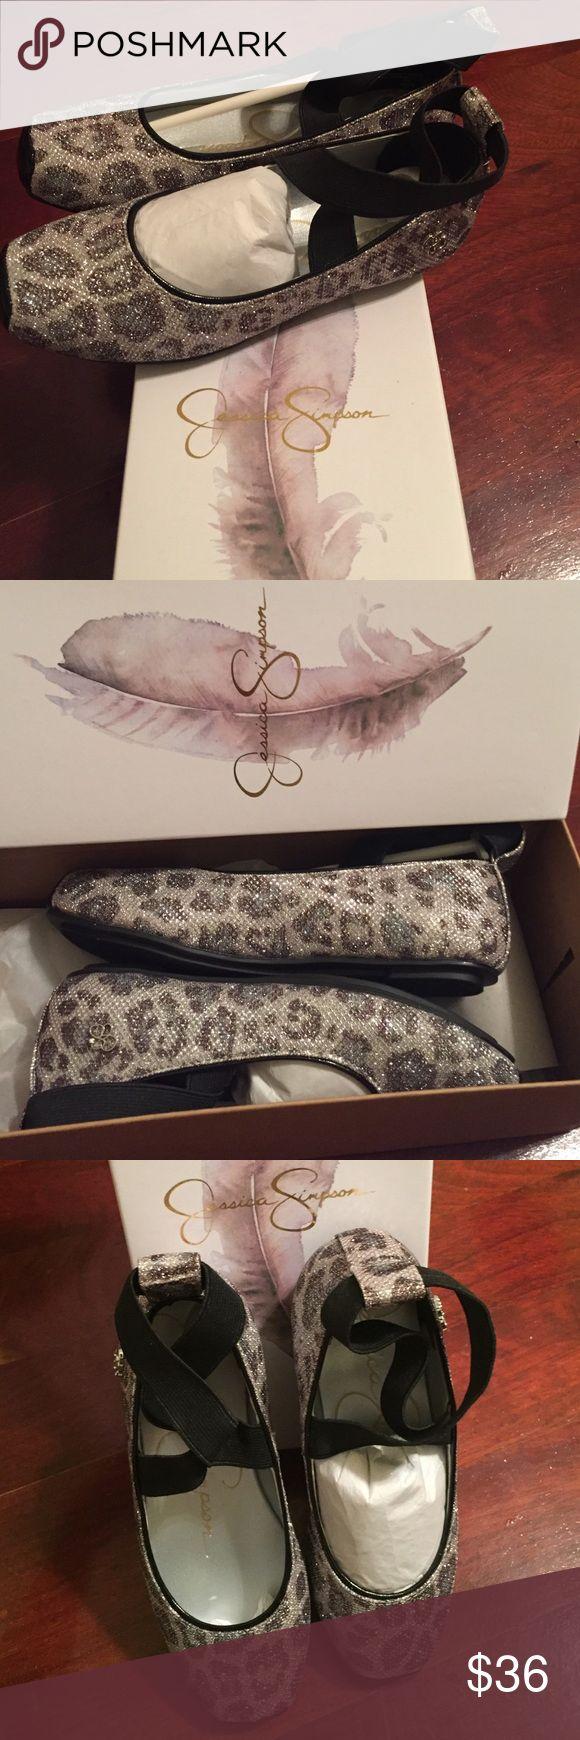 🎉NIB Jessica Simpson Madison Silver NIB Jessica Simpson Madison Silver JS 2073. . These shoes  have been reduced to Rock Bottom Price, no further discounts. Jessica Simpson Shoes Slippers